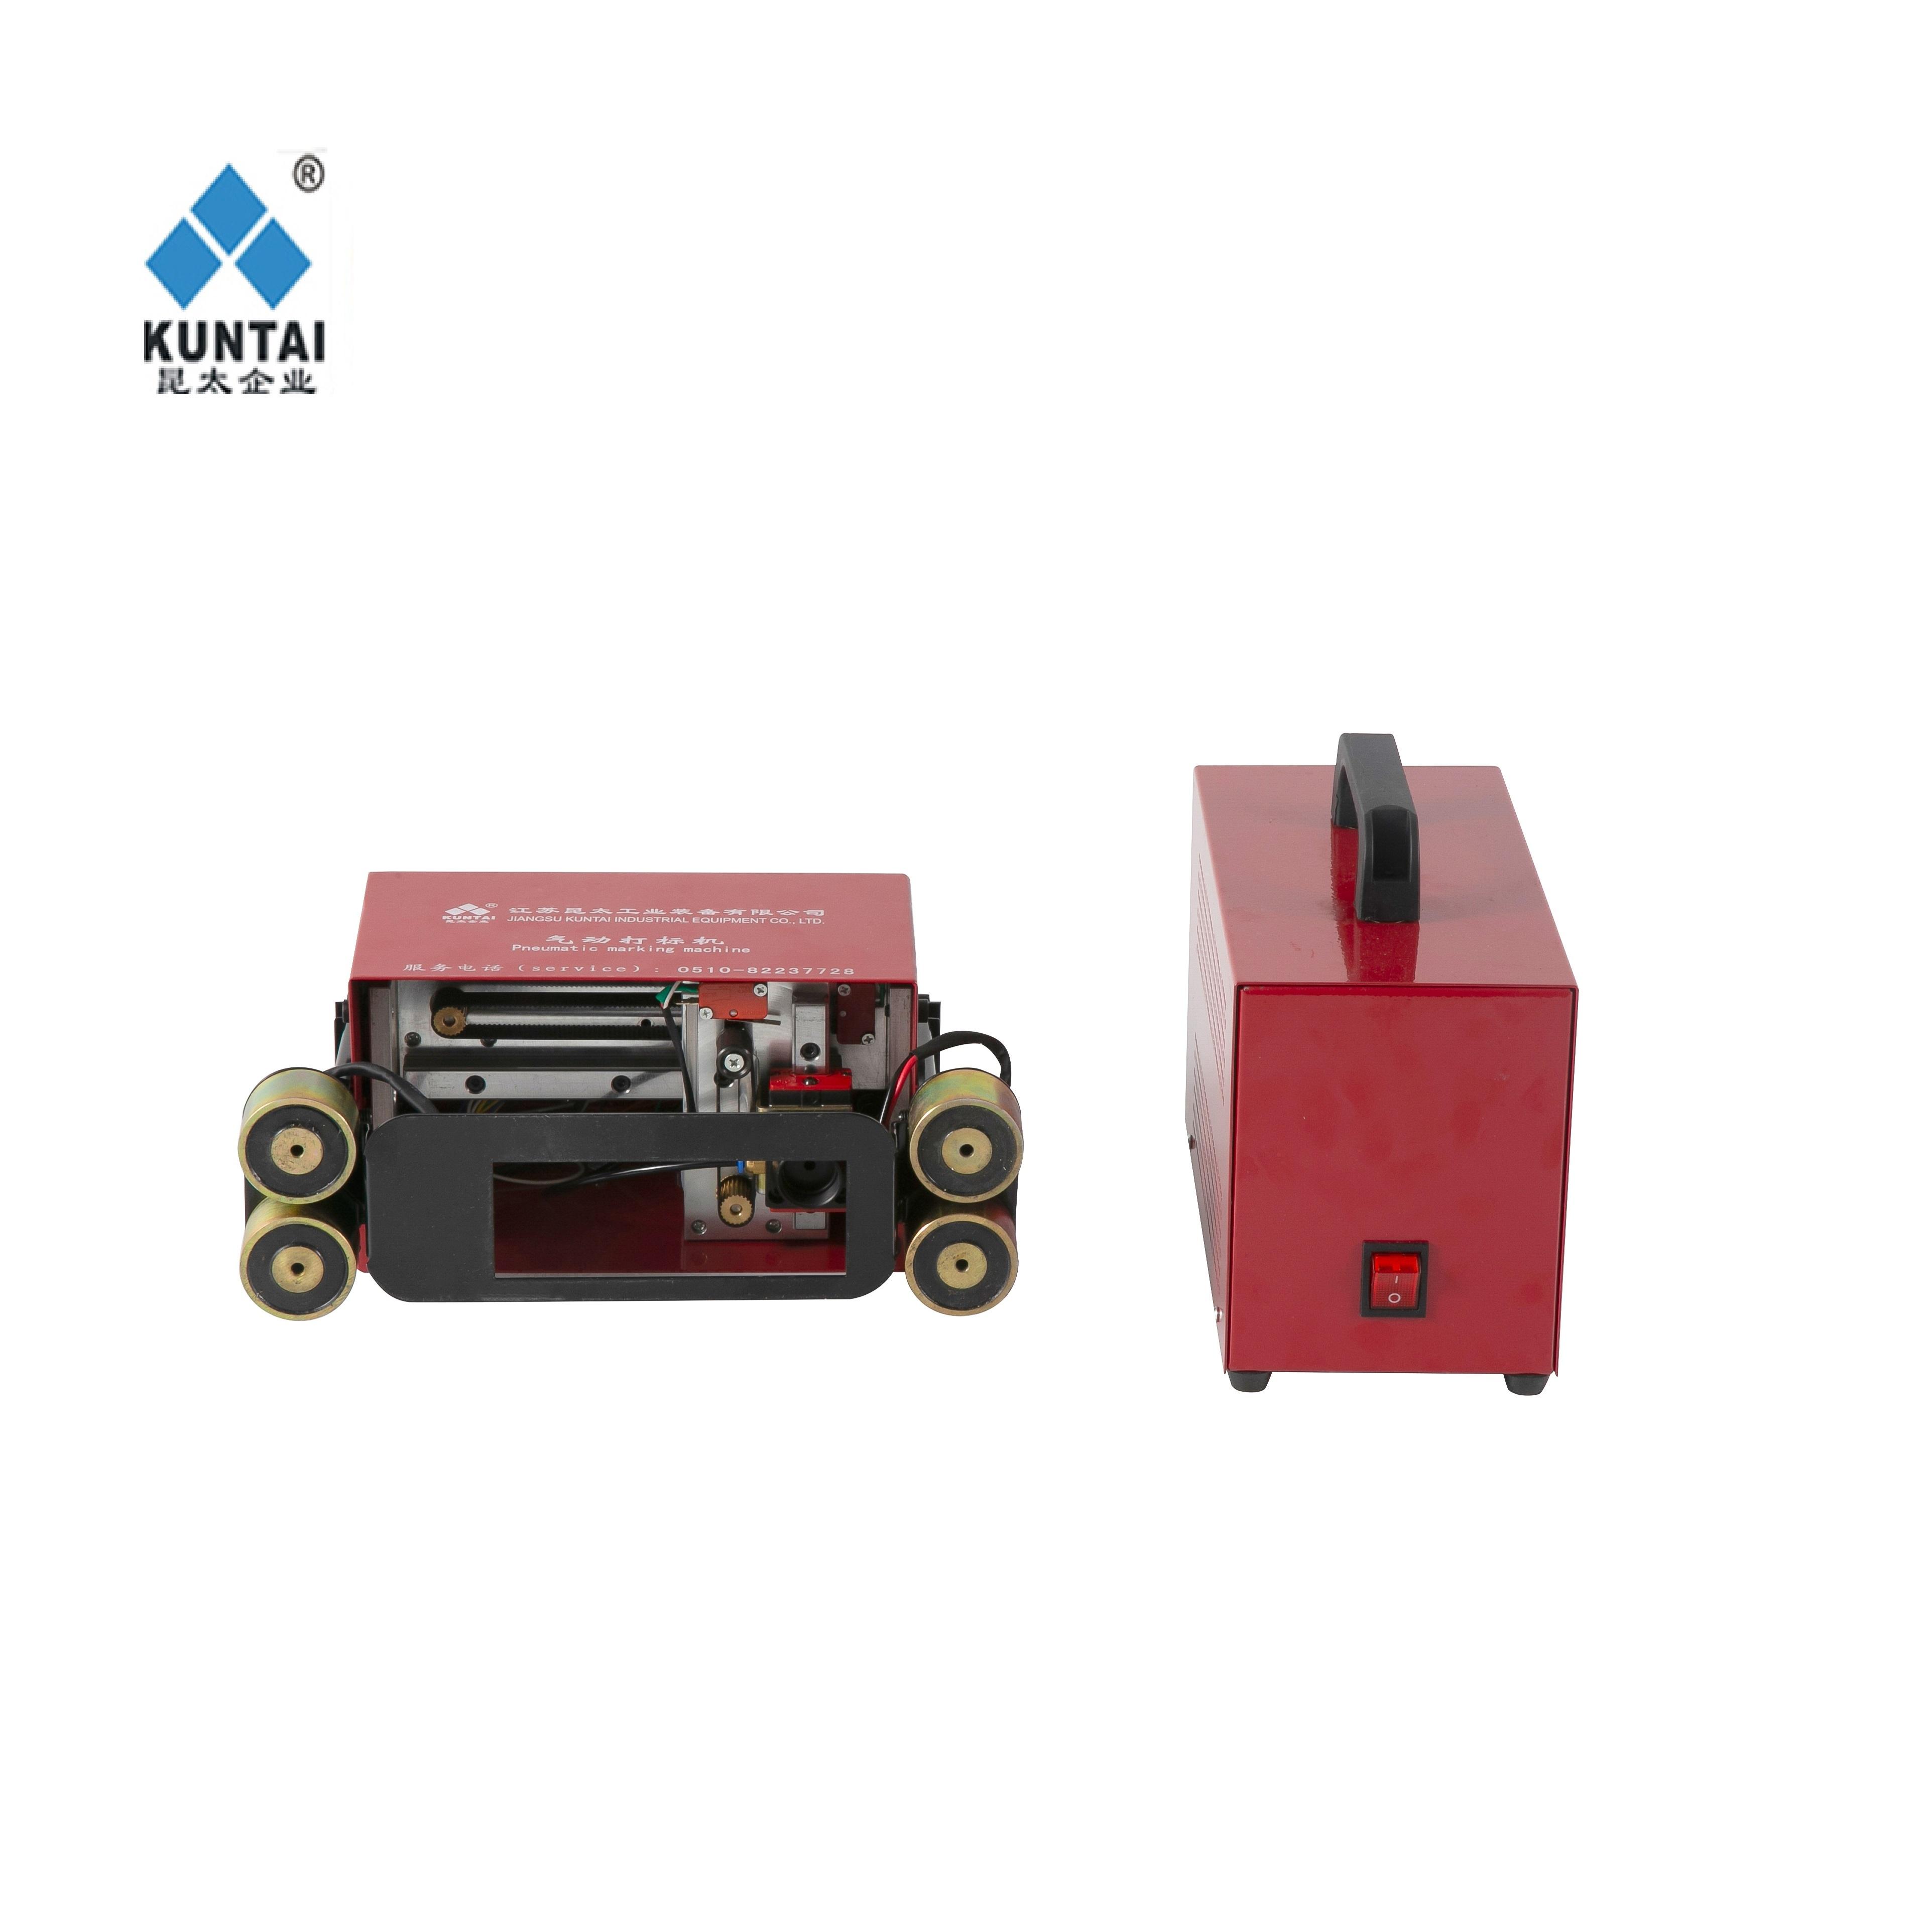 Handheld dot peen engraving machines chassis number vin code serial numbers marking printing machine